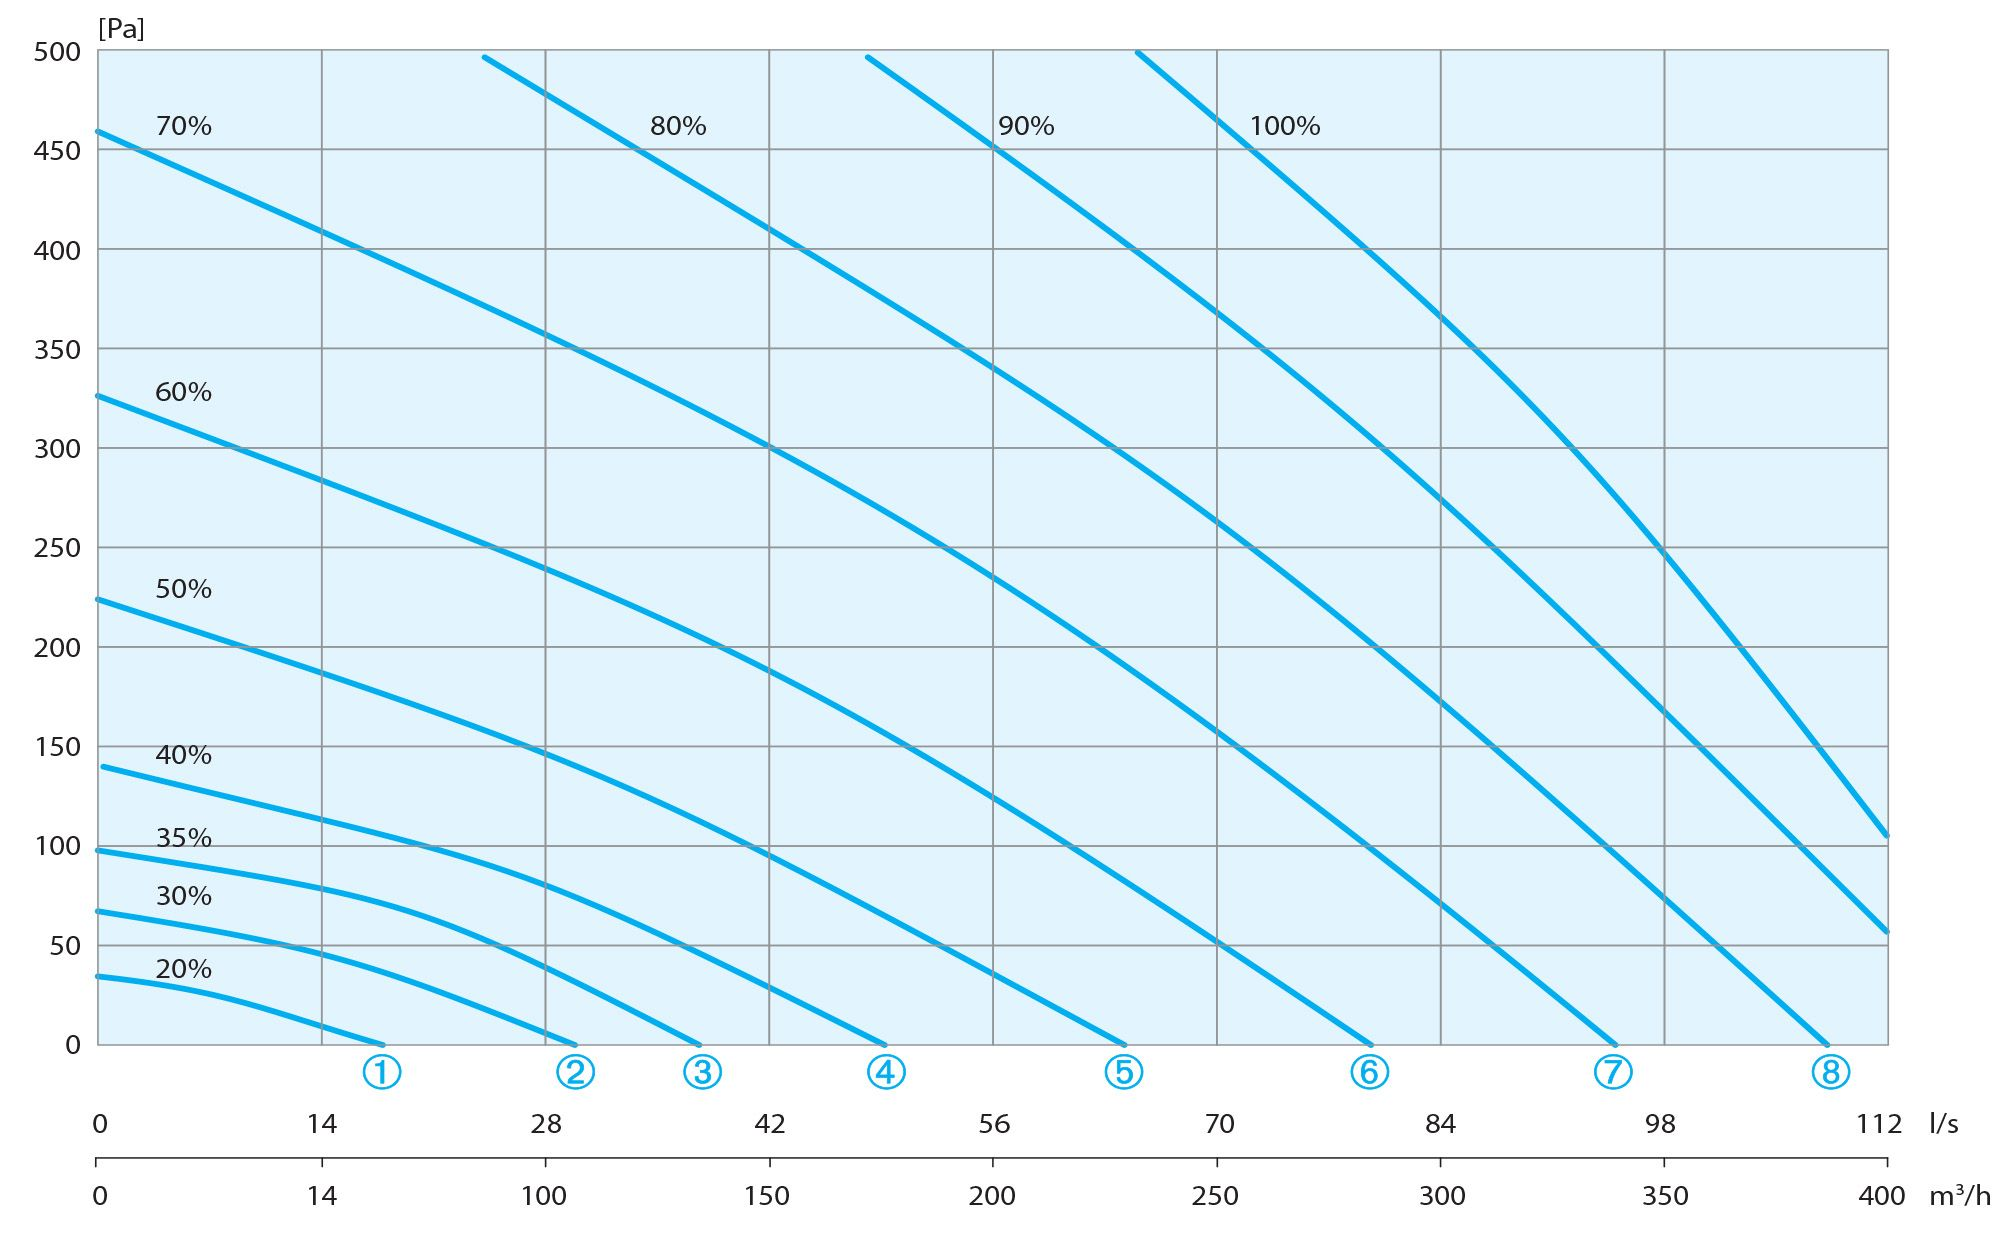 wykres sprezu rekuperatora aeris 350